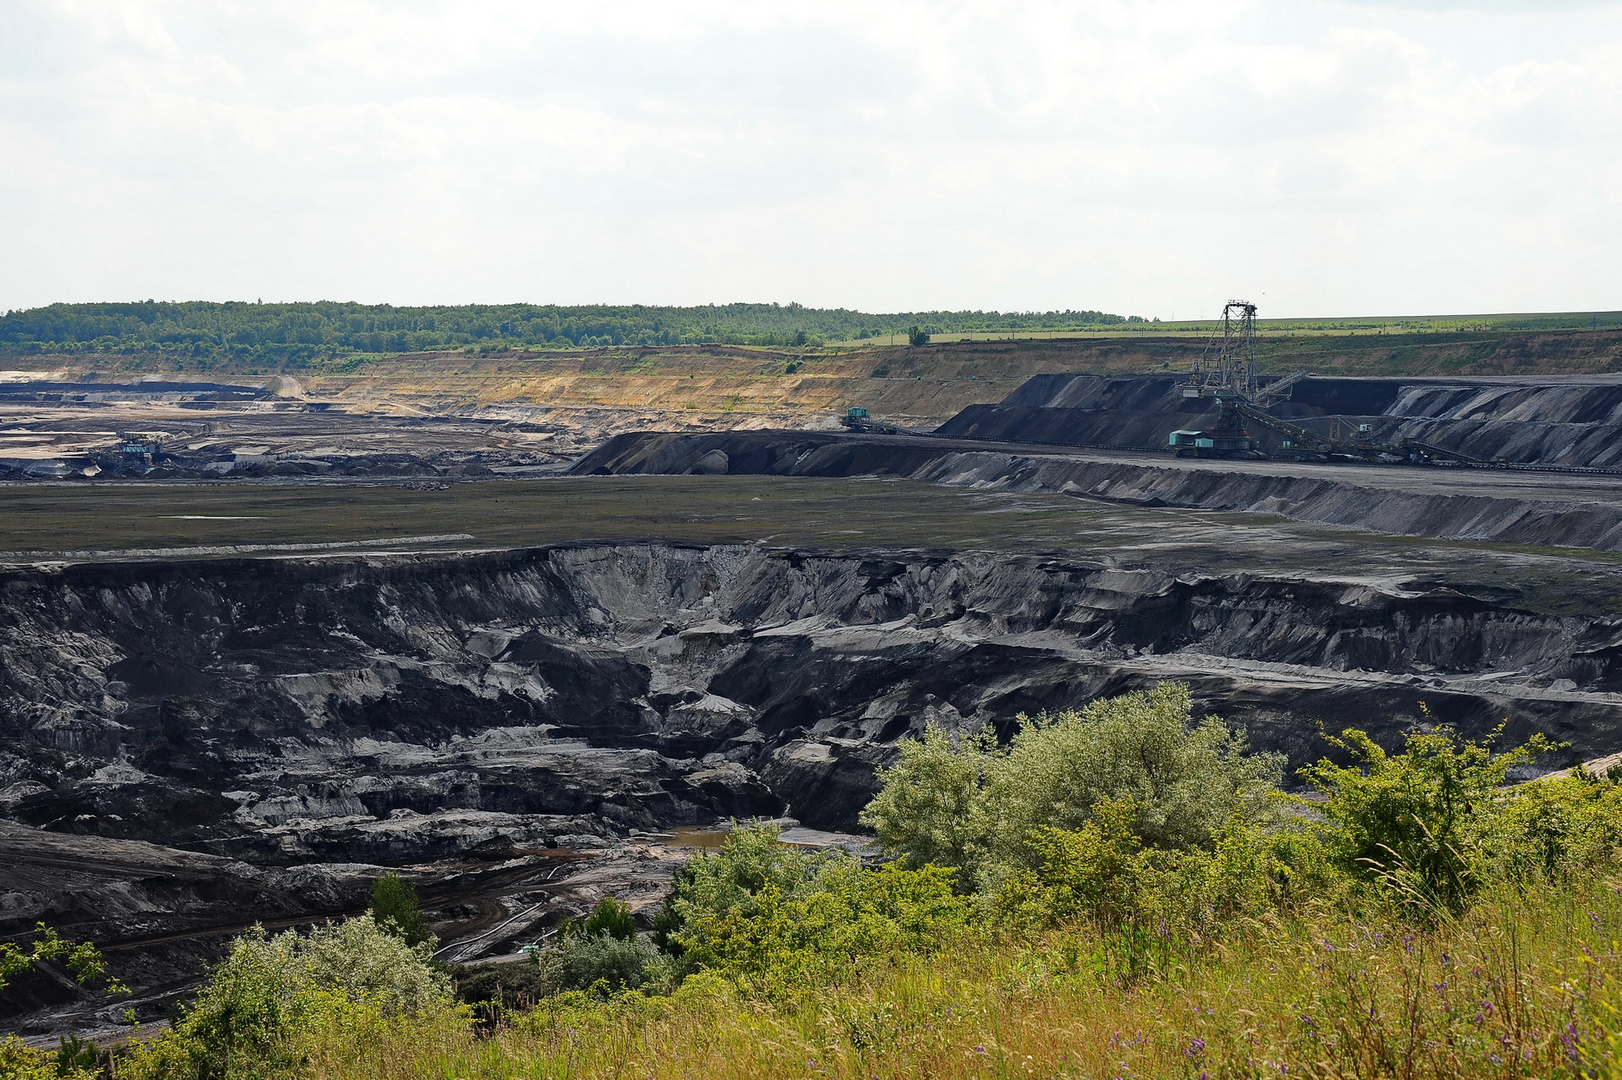 Tagebau Profen #3